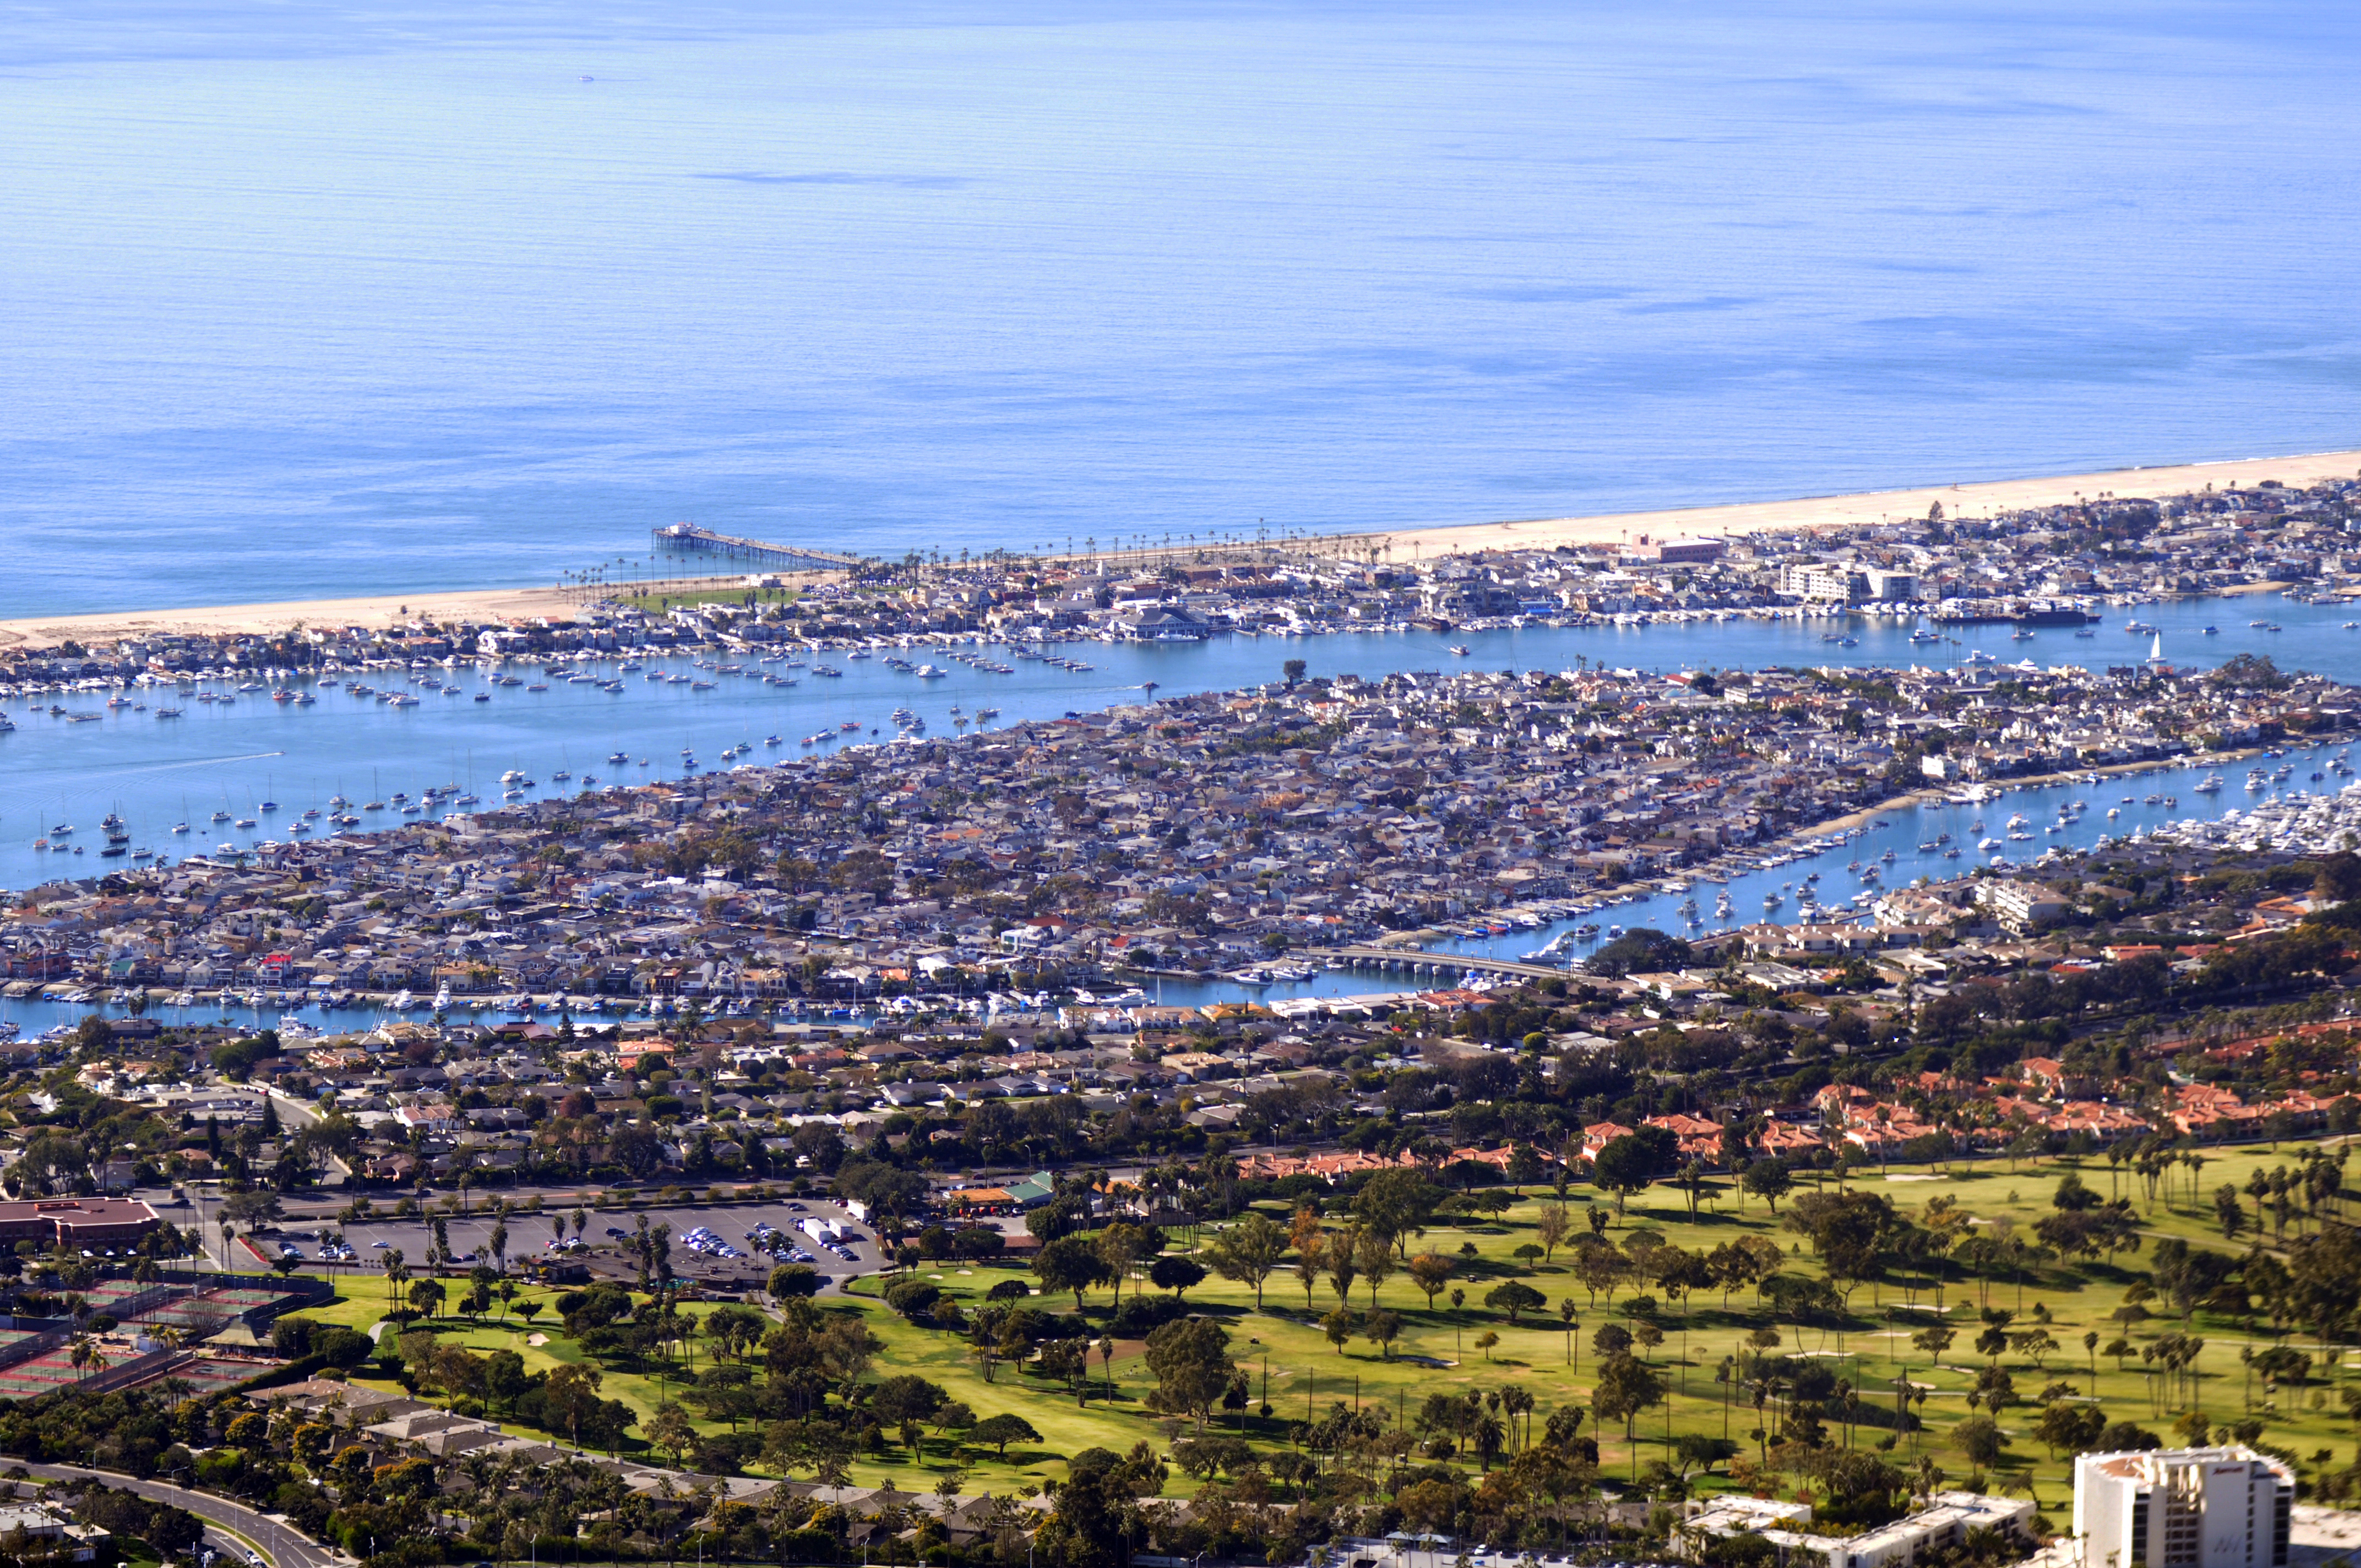 Balboa Island Newport Beach Wikipedia